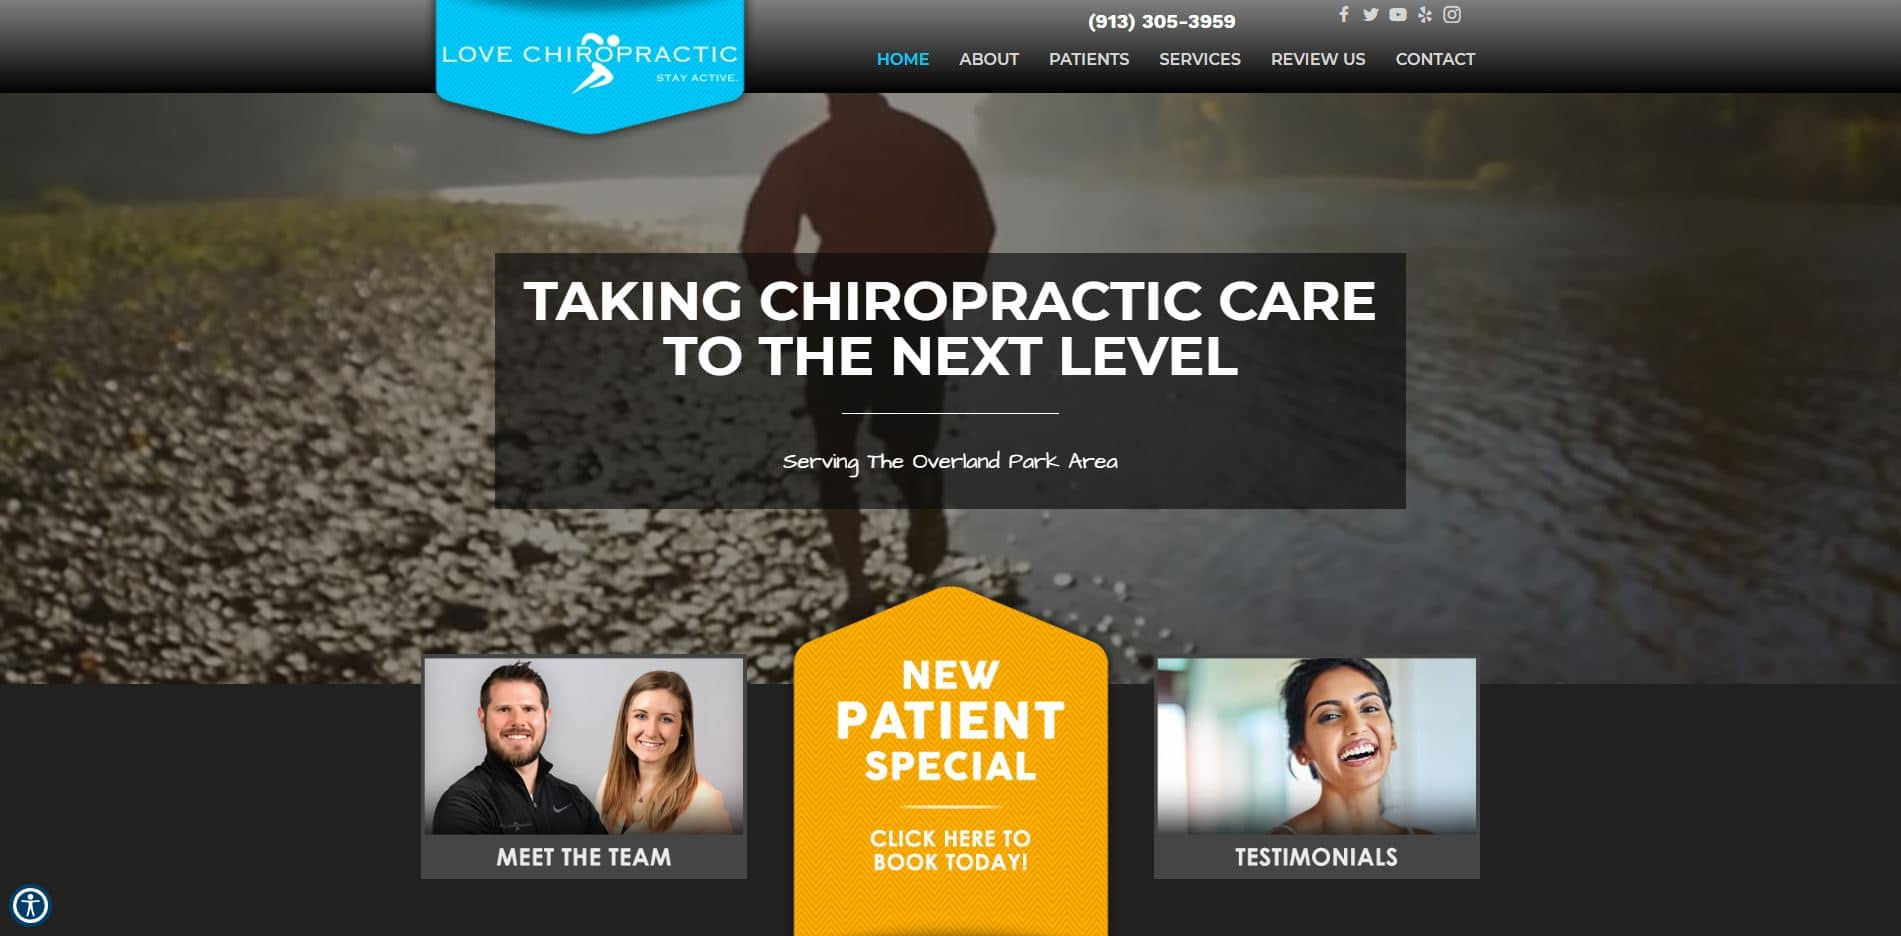 Chiropractor in Overland Park